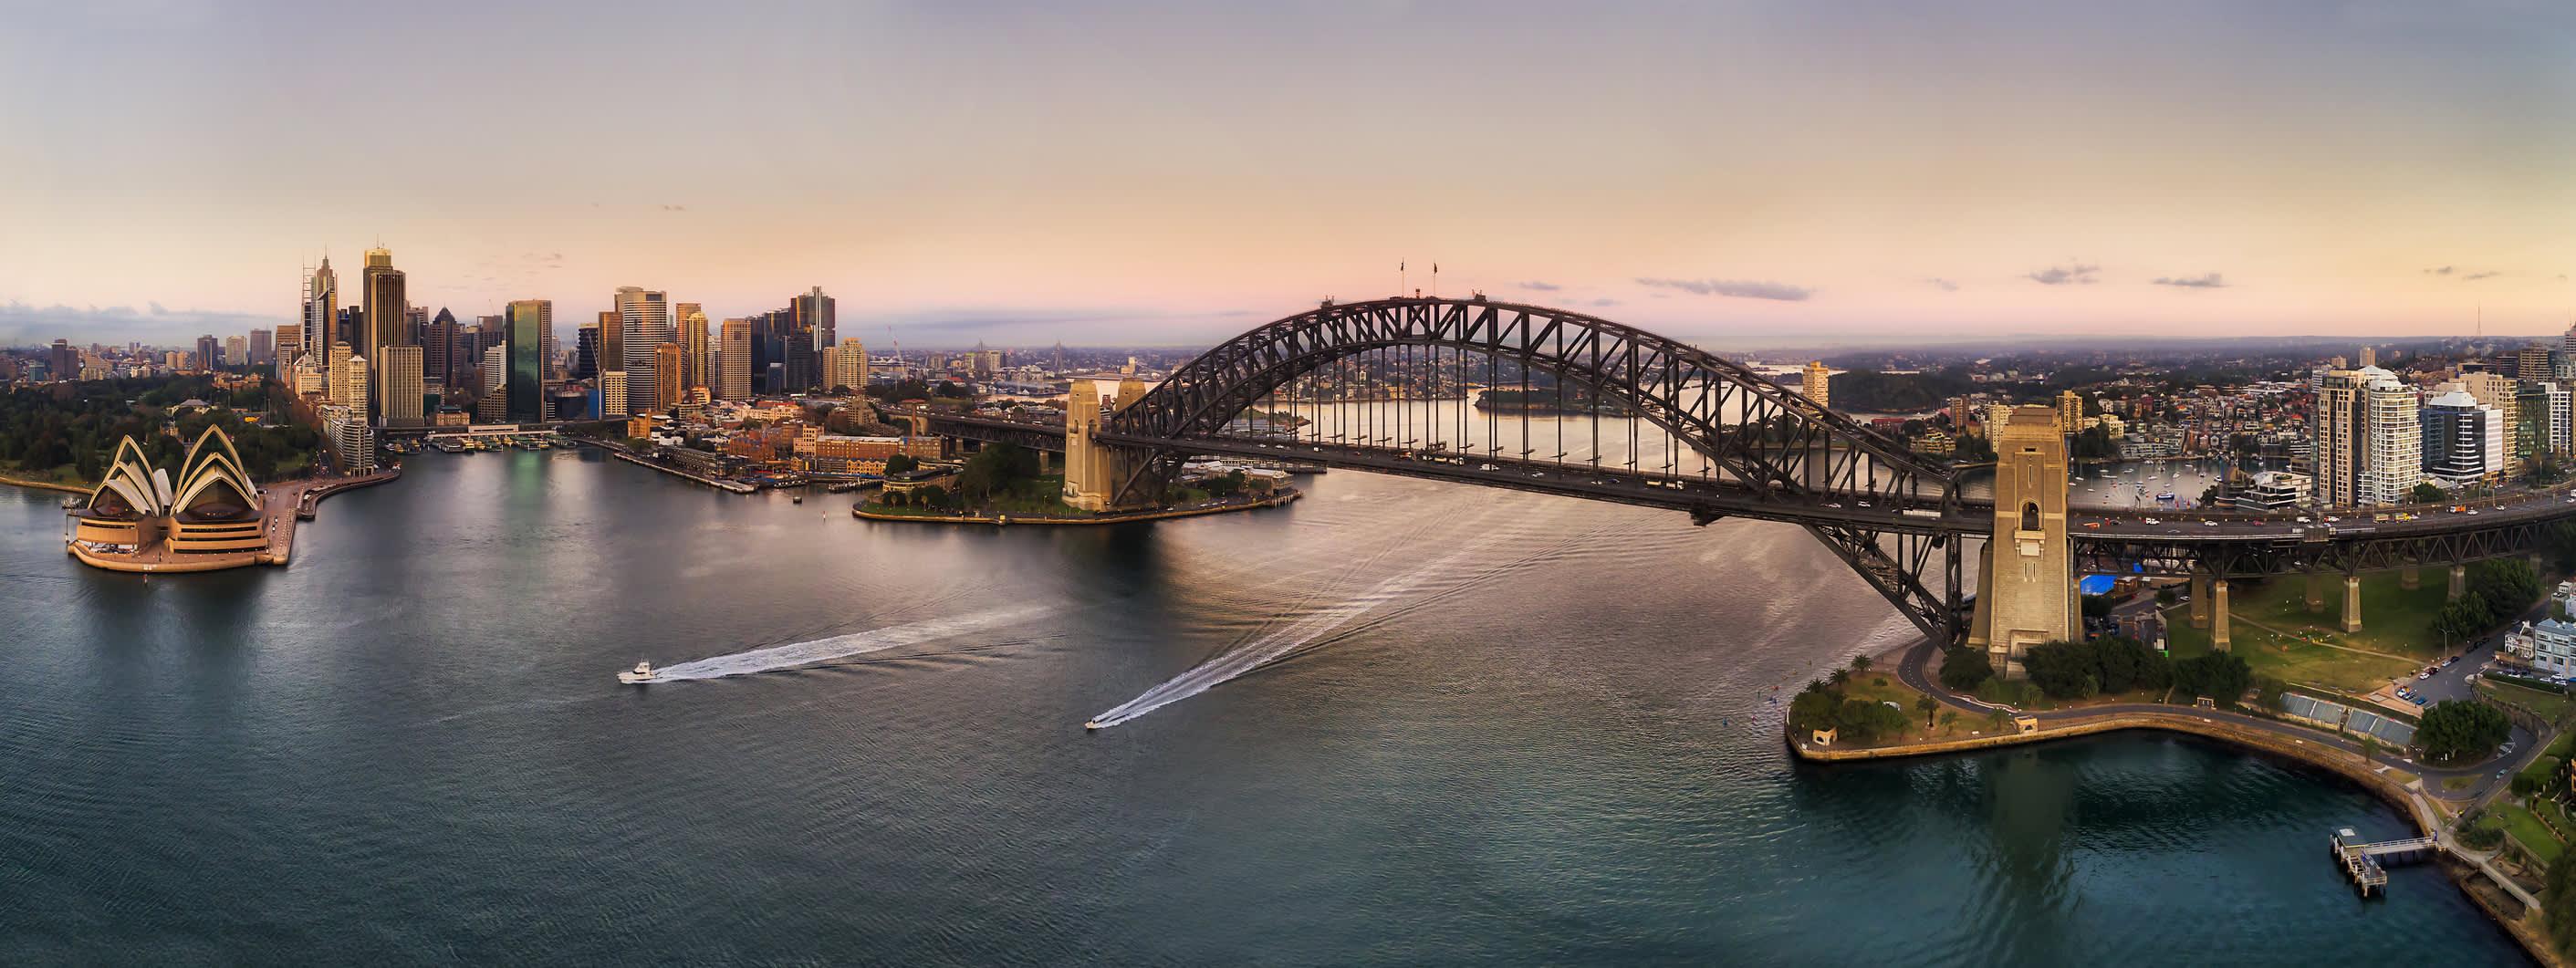 Australia's 25 best start-ups to work for, according to LinkedIn